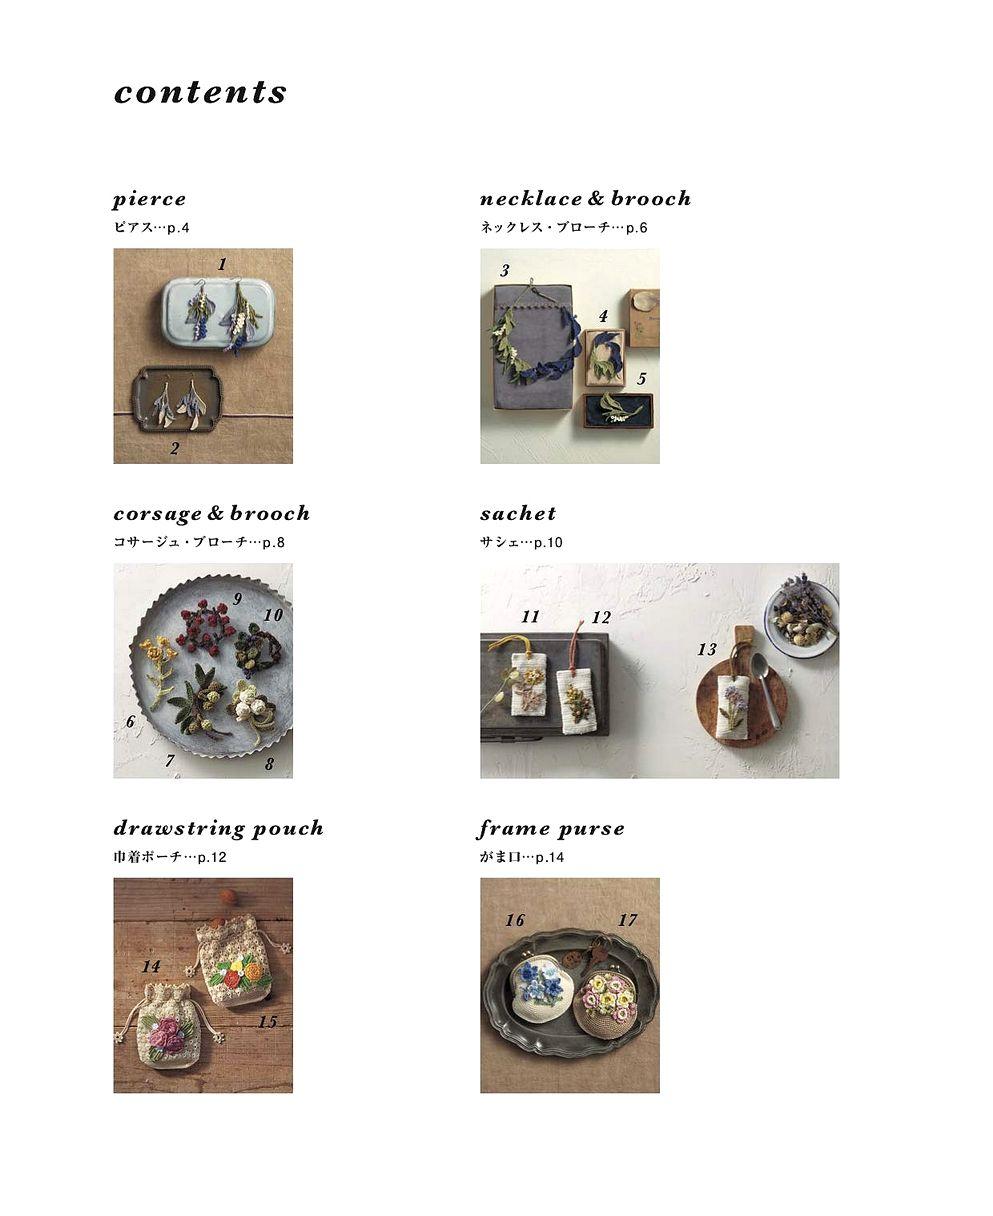 Crochet Botanical Item 2020 - журнал со схемами (2)